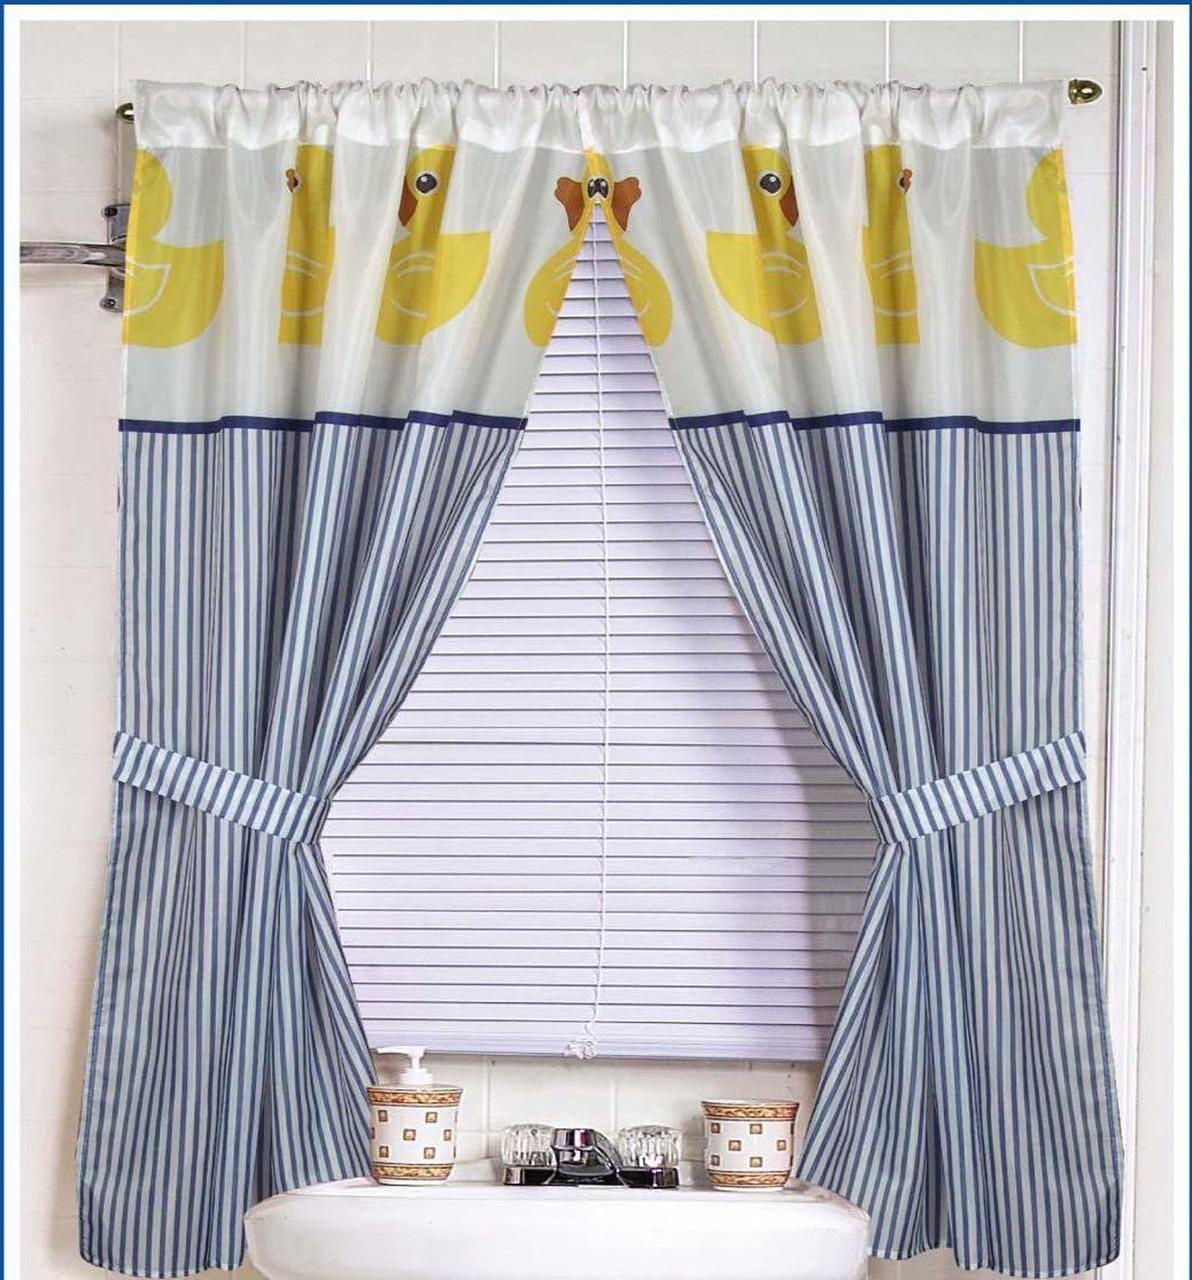 Rubber Ducky Fabric Window Curtain